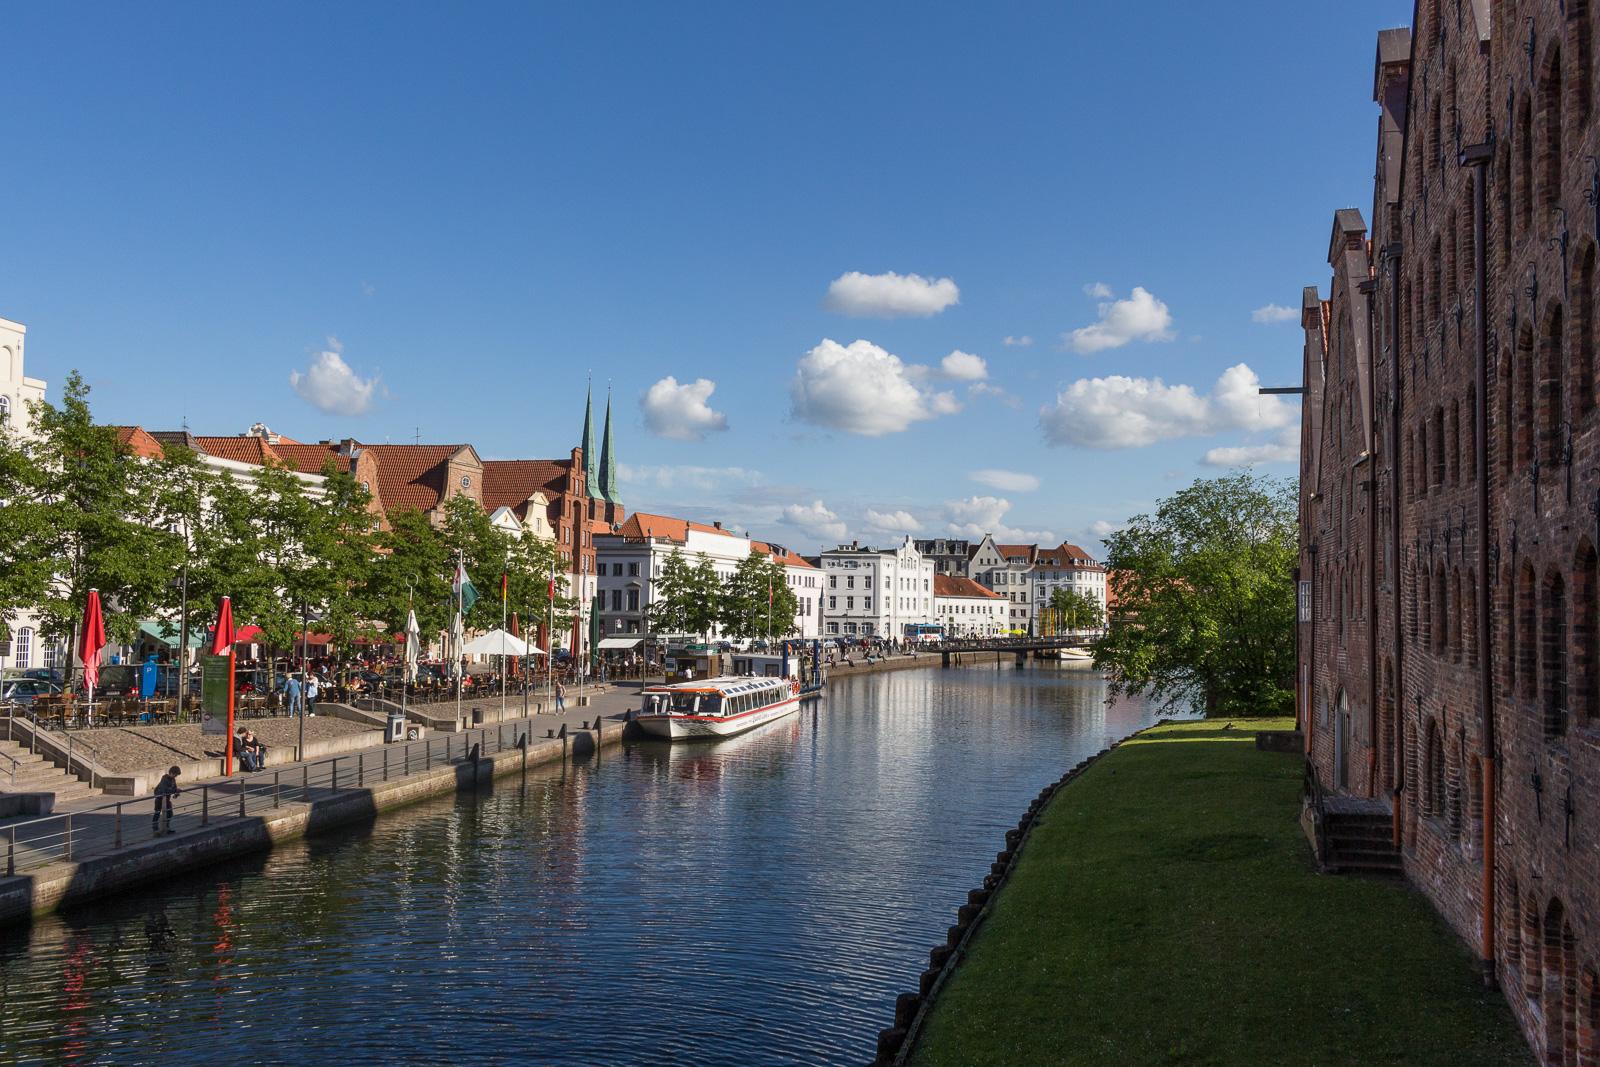 Lübeck, Luebeck, Lübecker Altstadt, Sightseeing, Städtetour, Luebeck entdecken, Unesco Weltkuturerbe, Sightseeing, Marzipan, Trave,